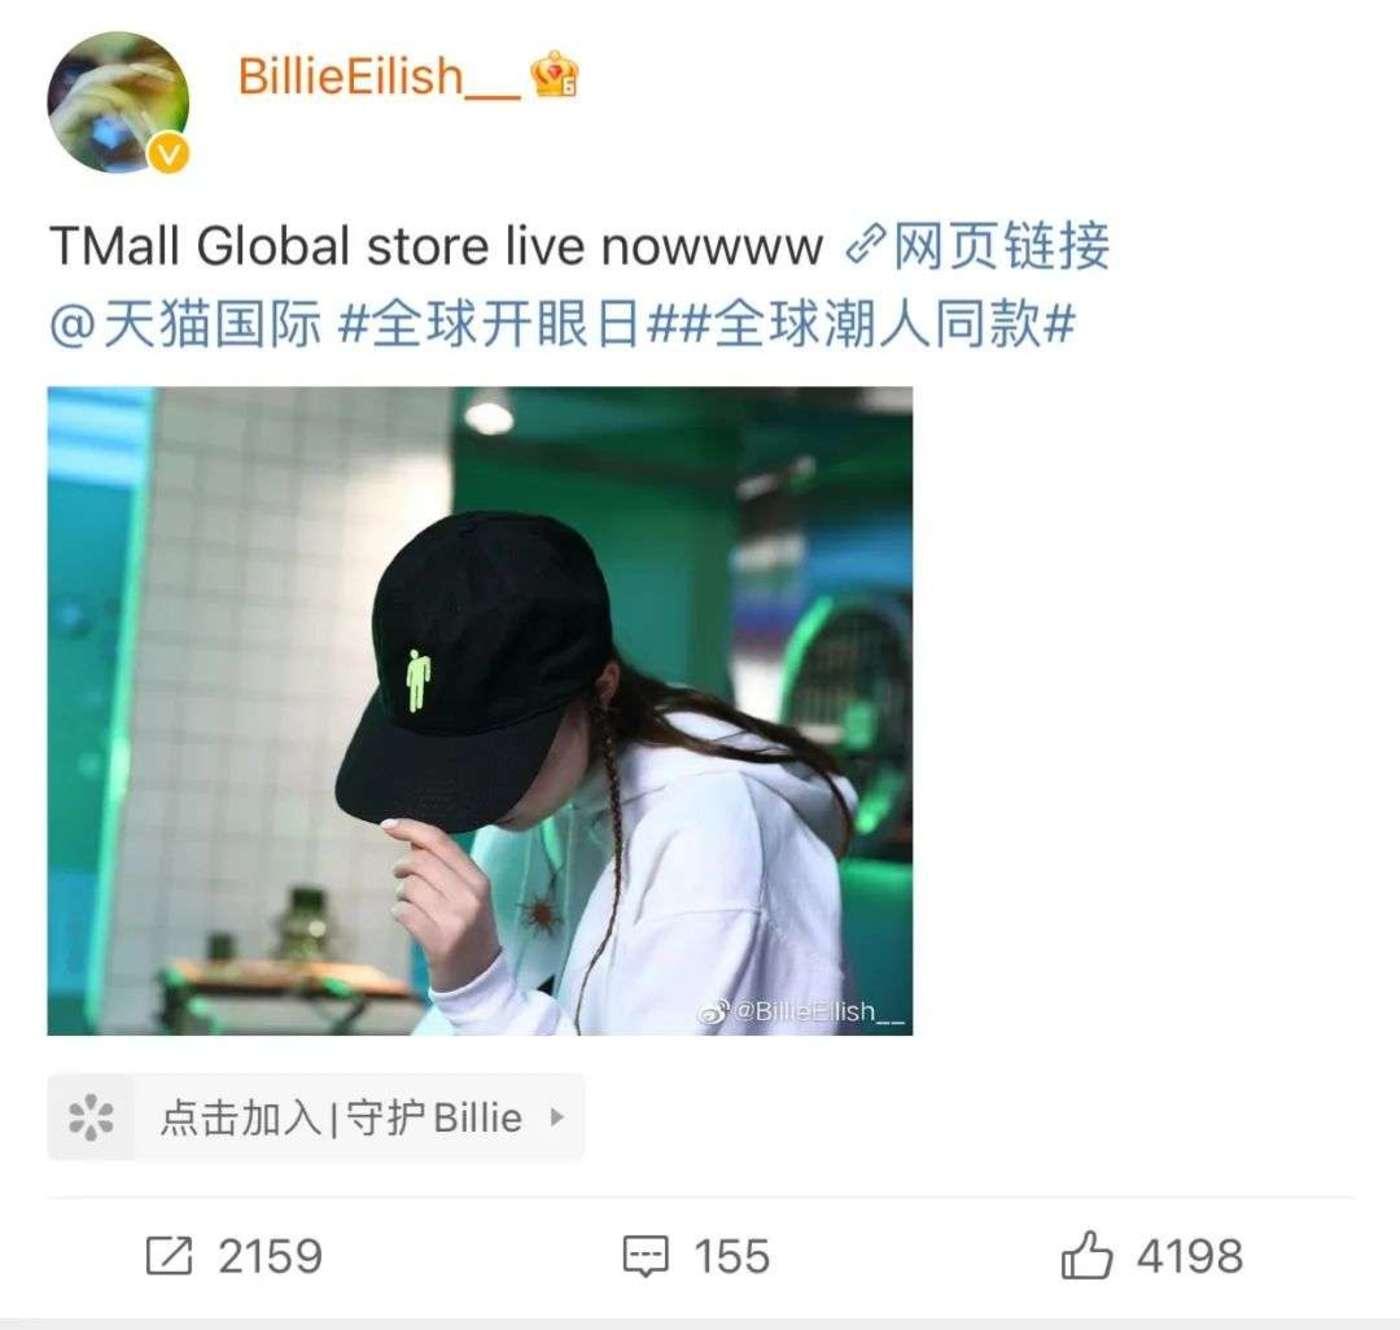 Billie Eilish碧梨个人同名品牌正式入驻天猫国际